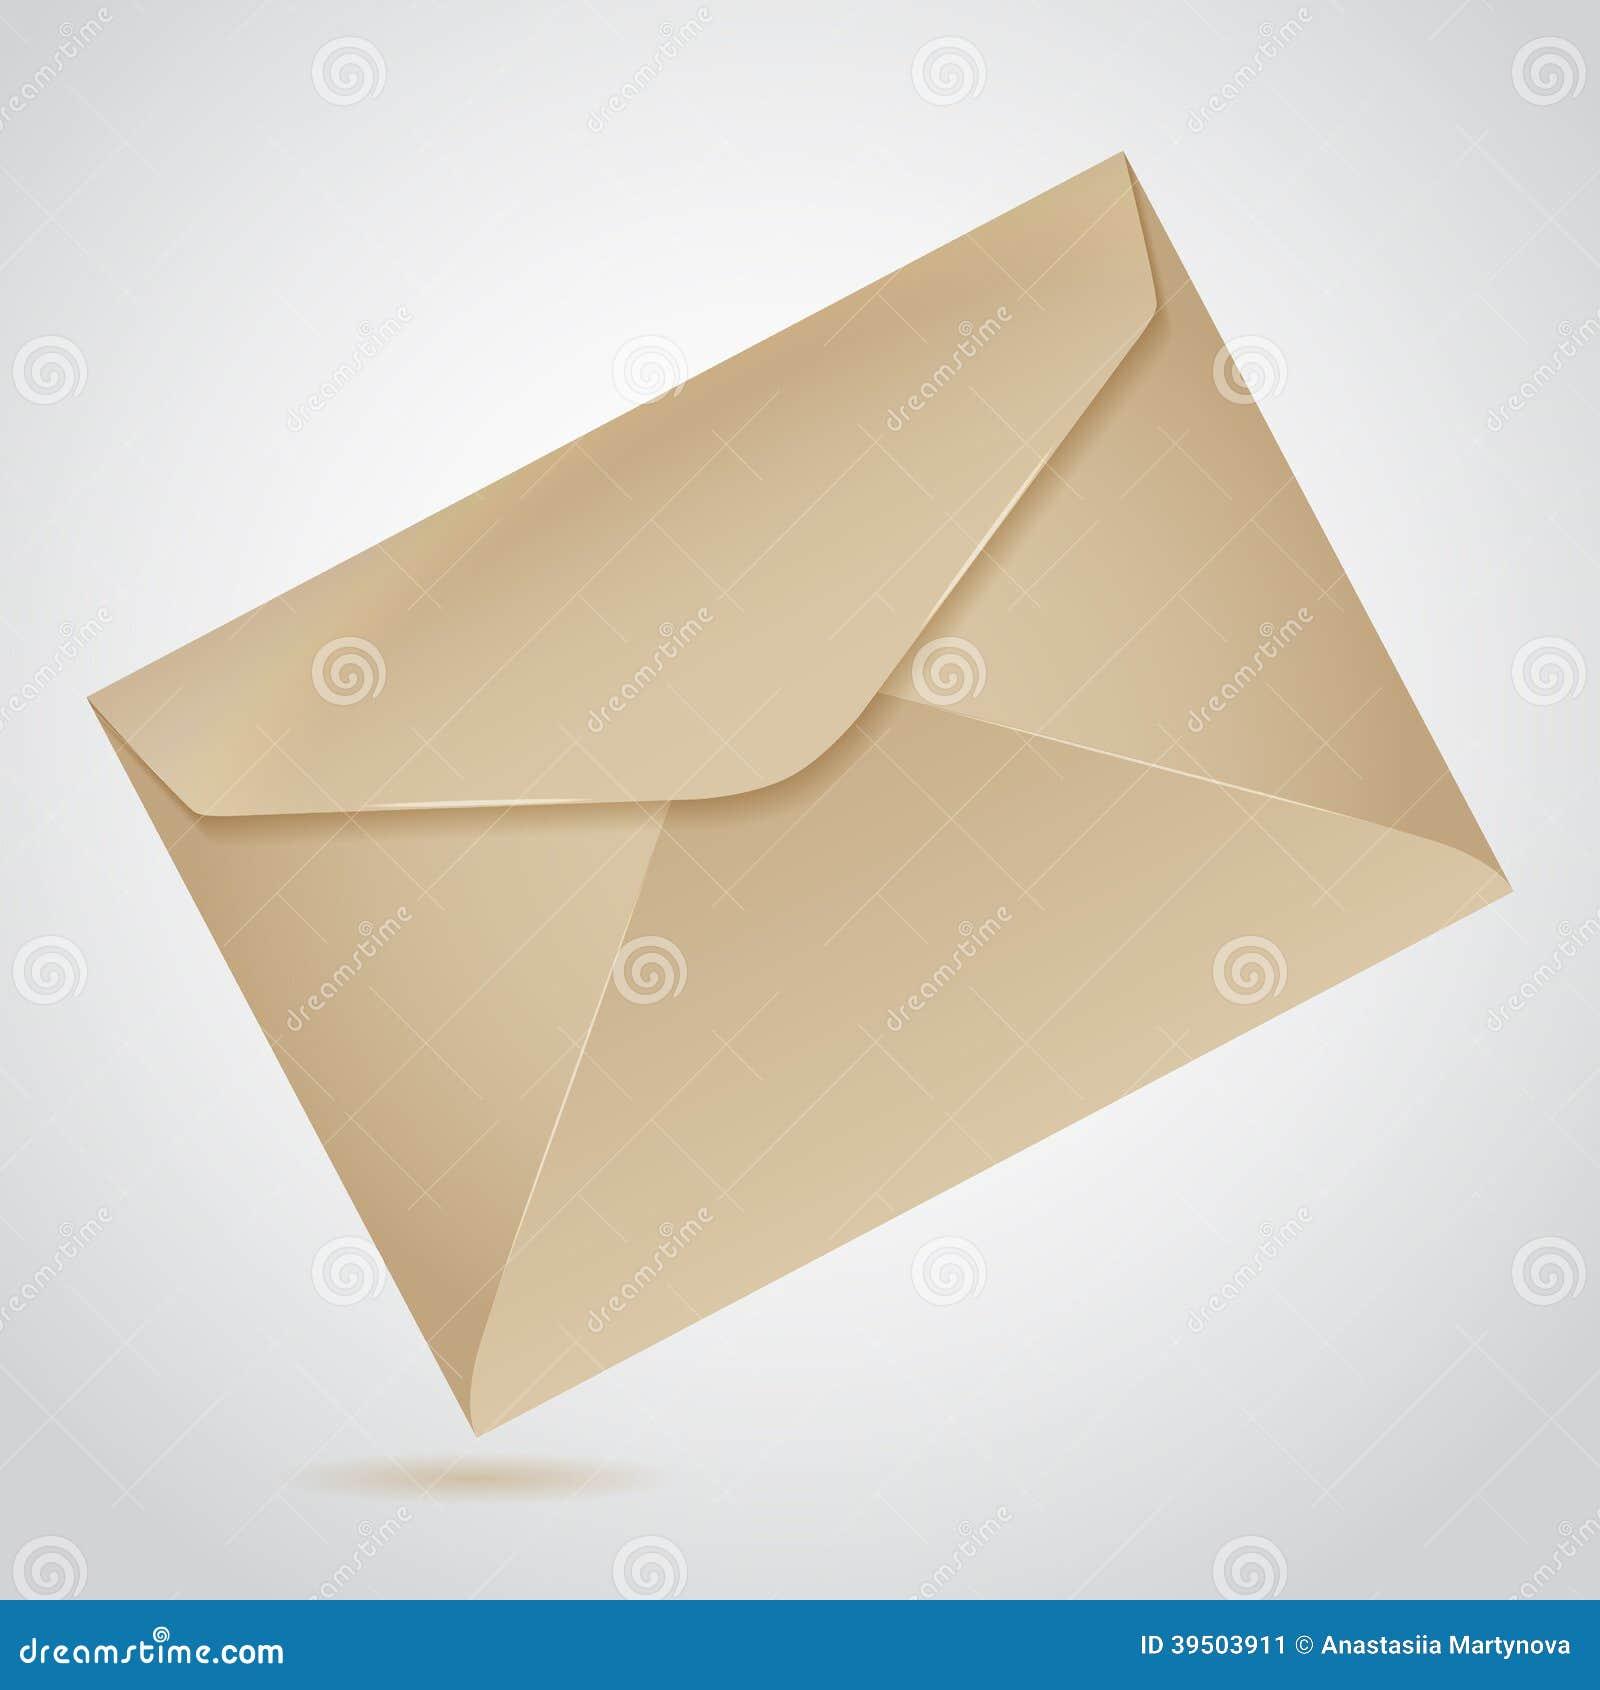 Envelope of brown paper